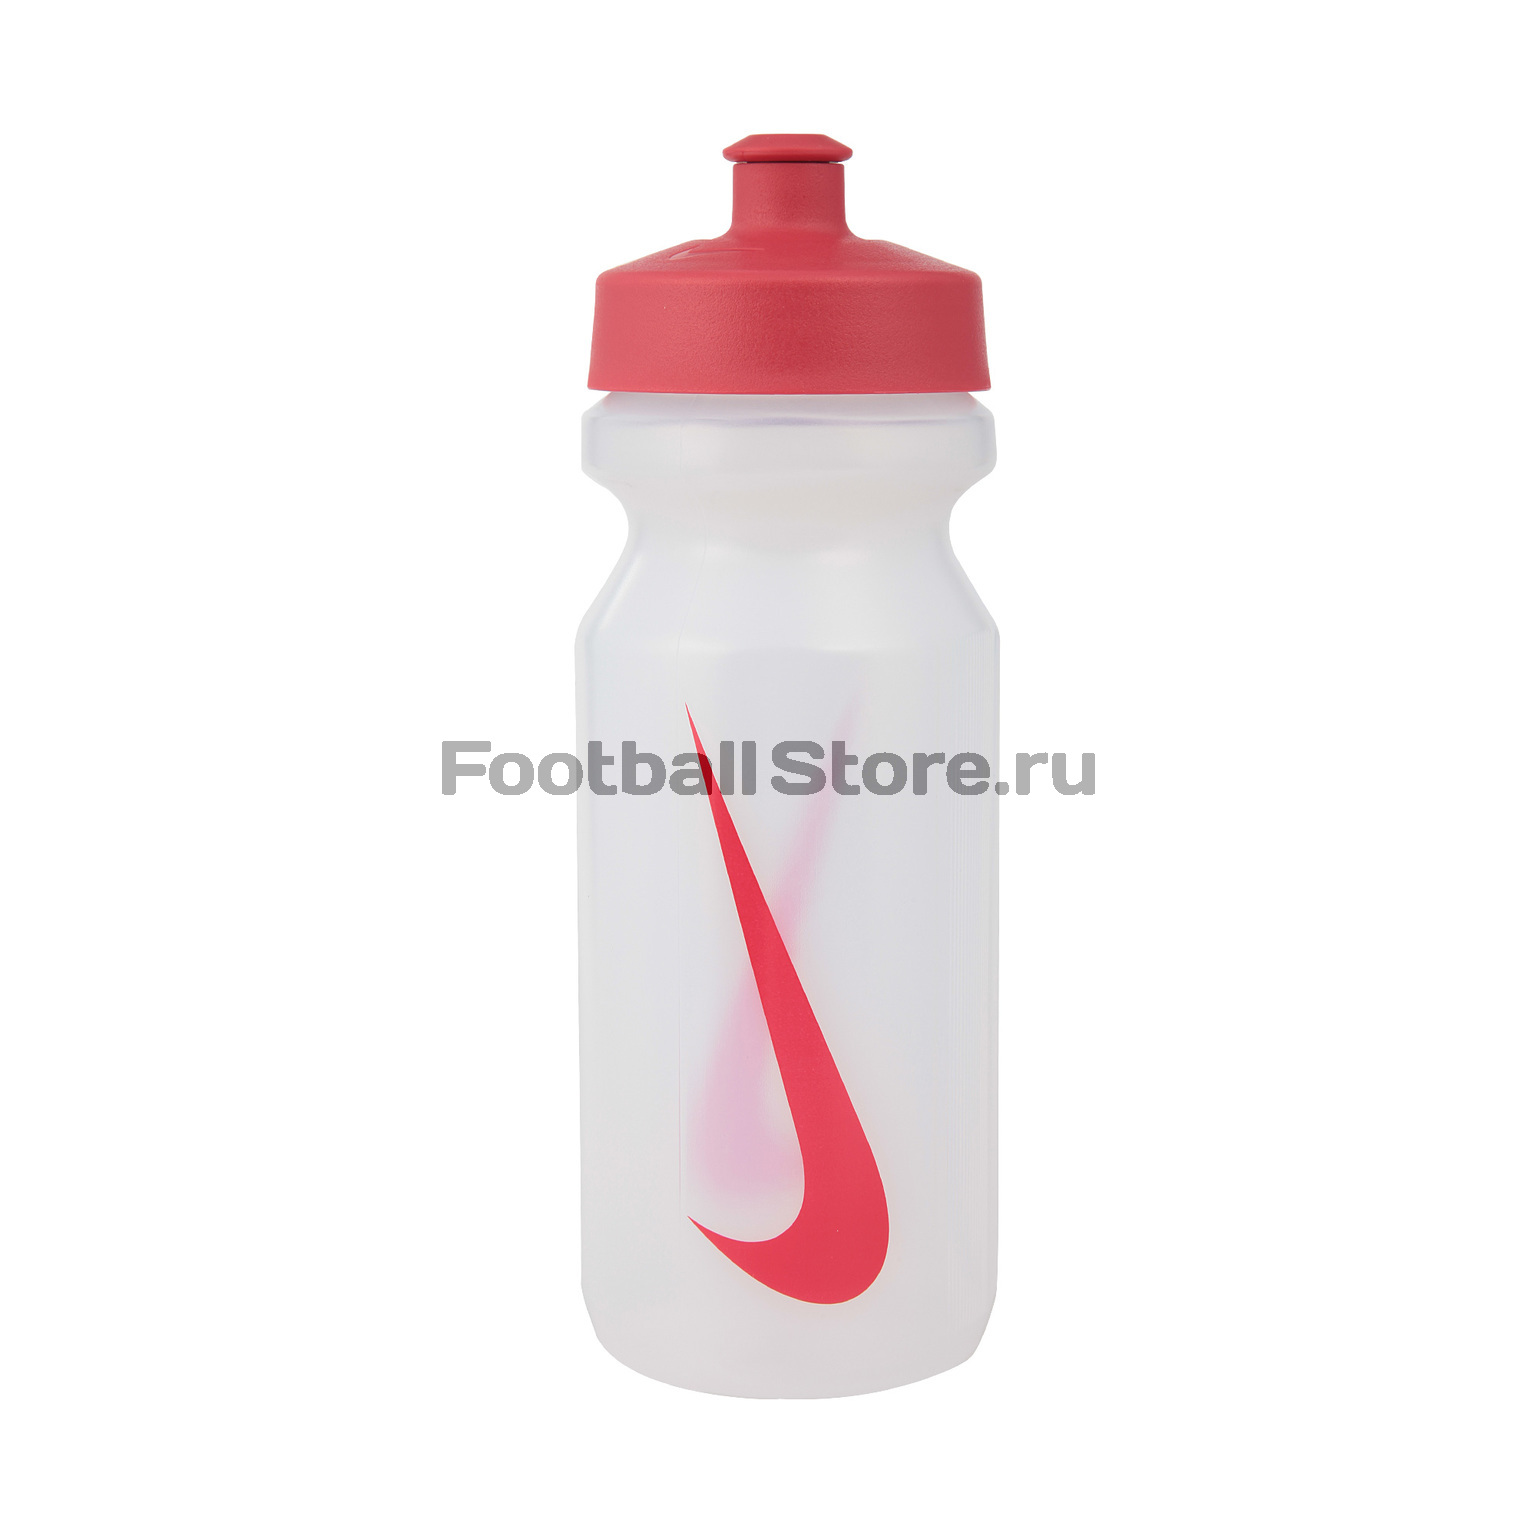 Бутылка для воды Nike Big Mouth Water 220 Z Clear Sport N.OB.17.946.22 бутылка для воды nike 0 65 л big mouth water bottle nob17 968 прозр чер